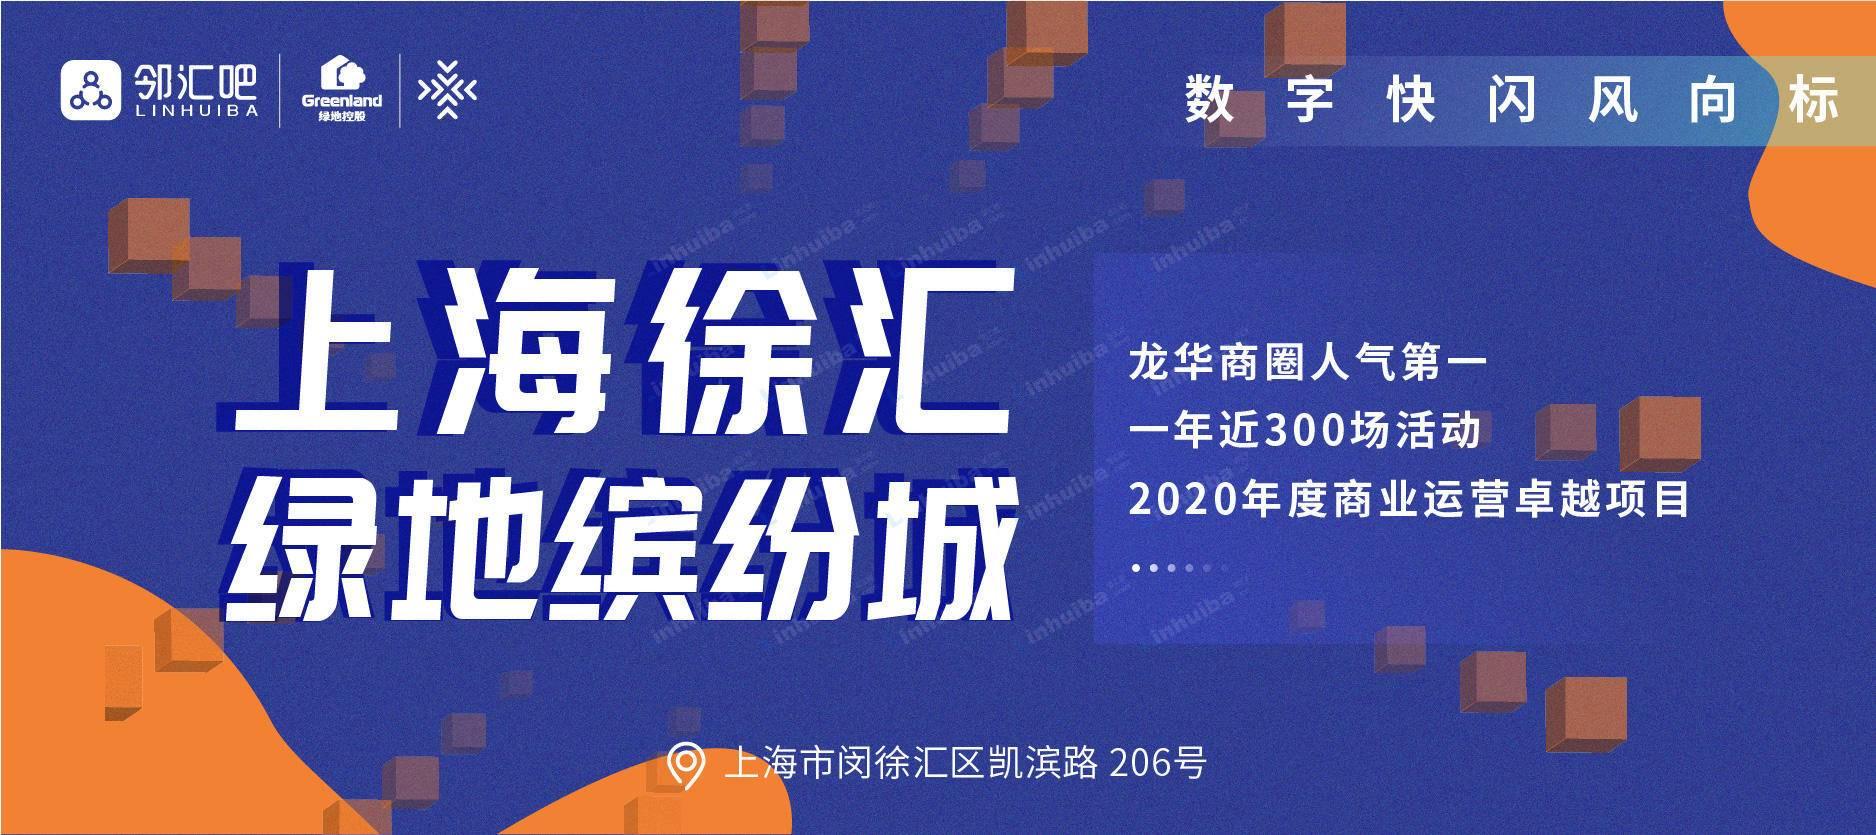 PMS场地推荐-上海徐汇绿地缤纷城